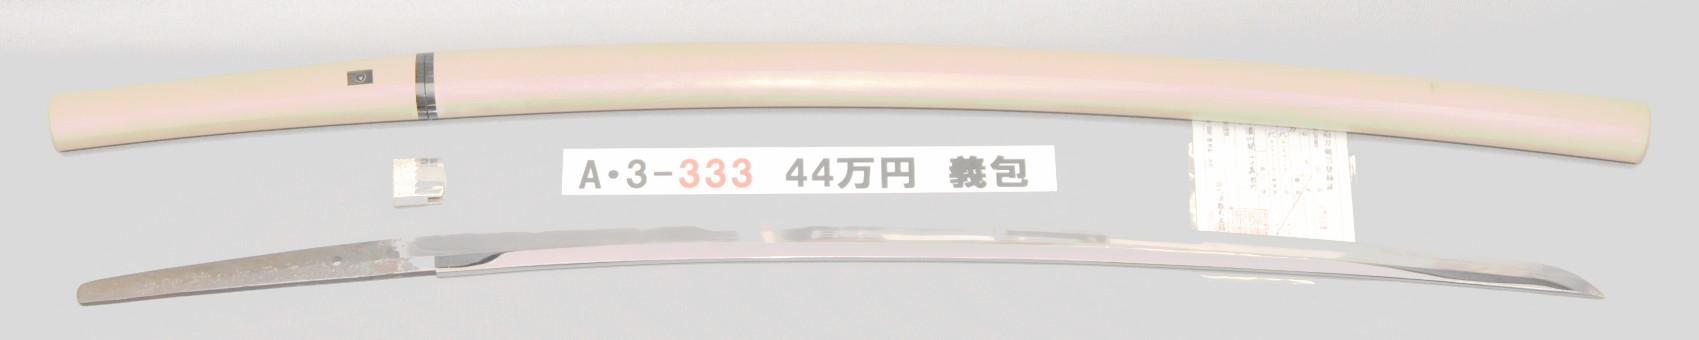 A3333